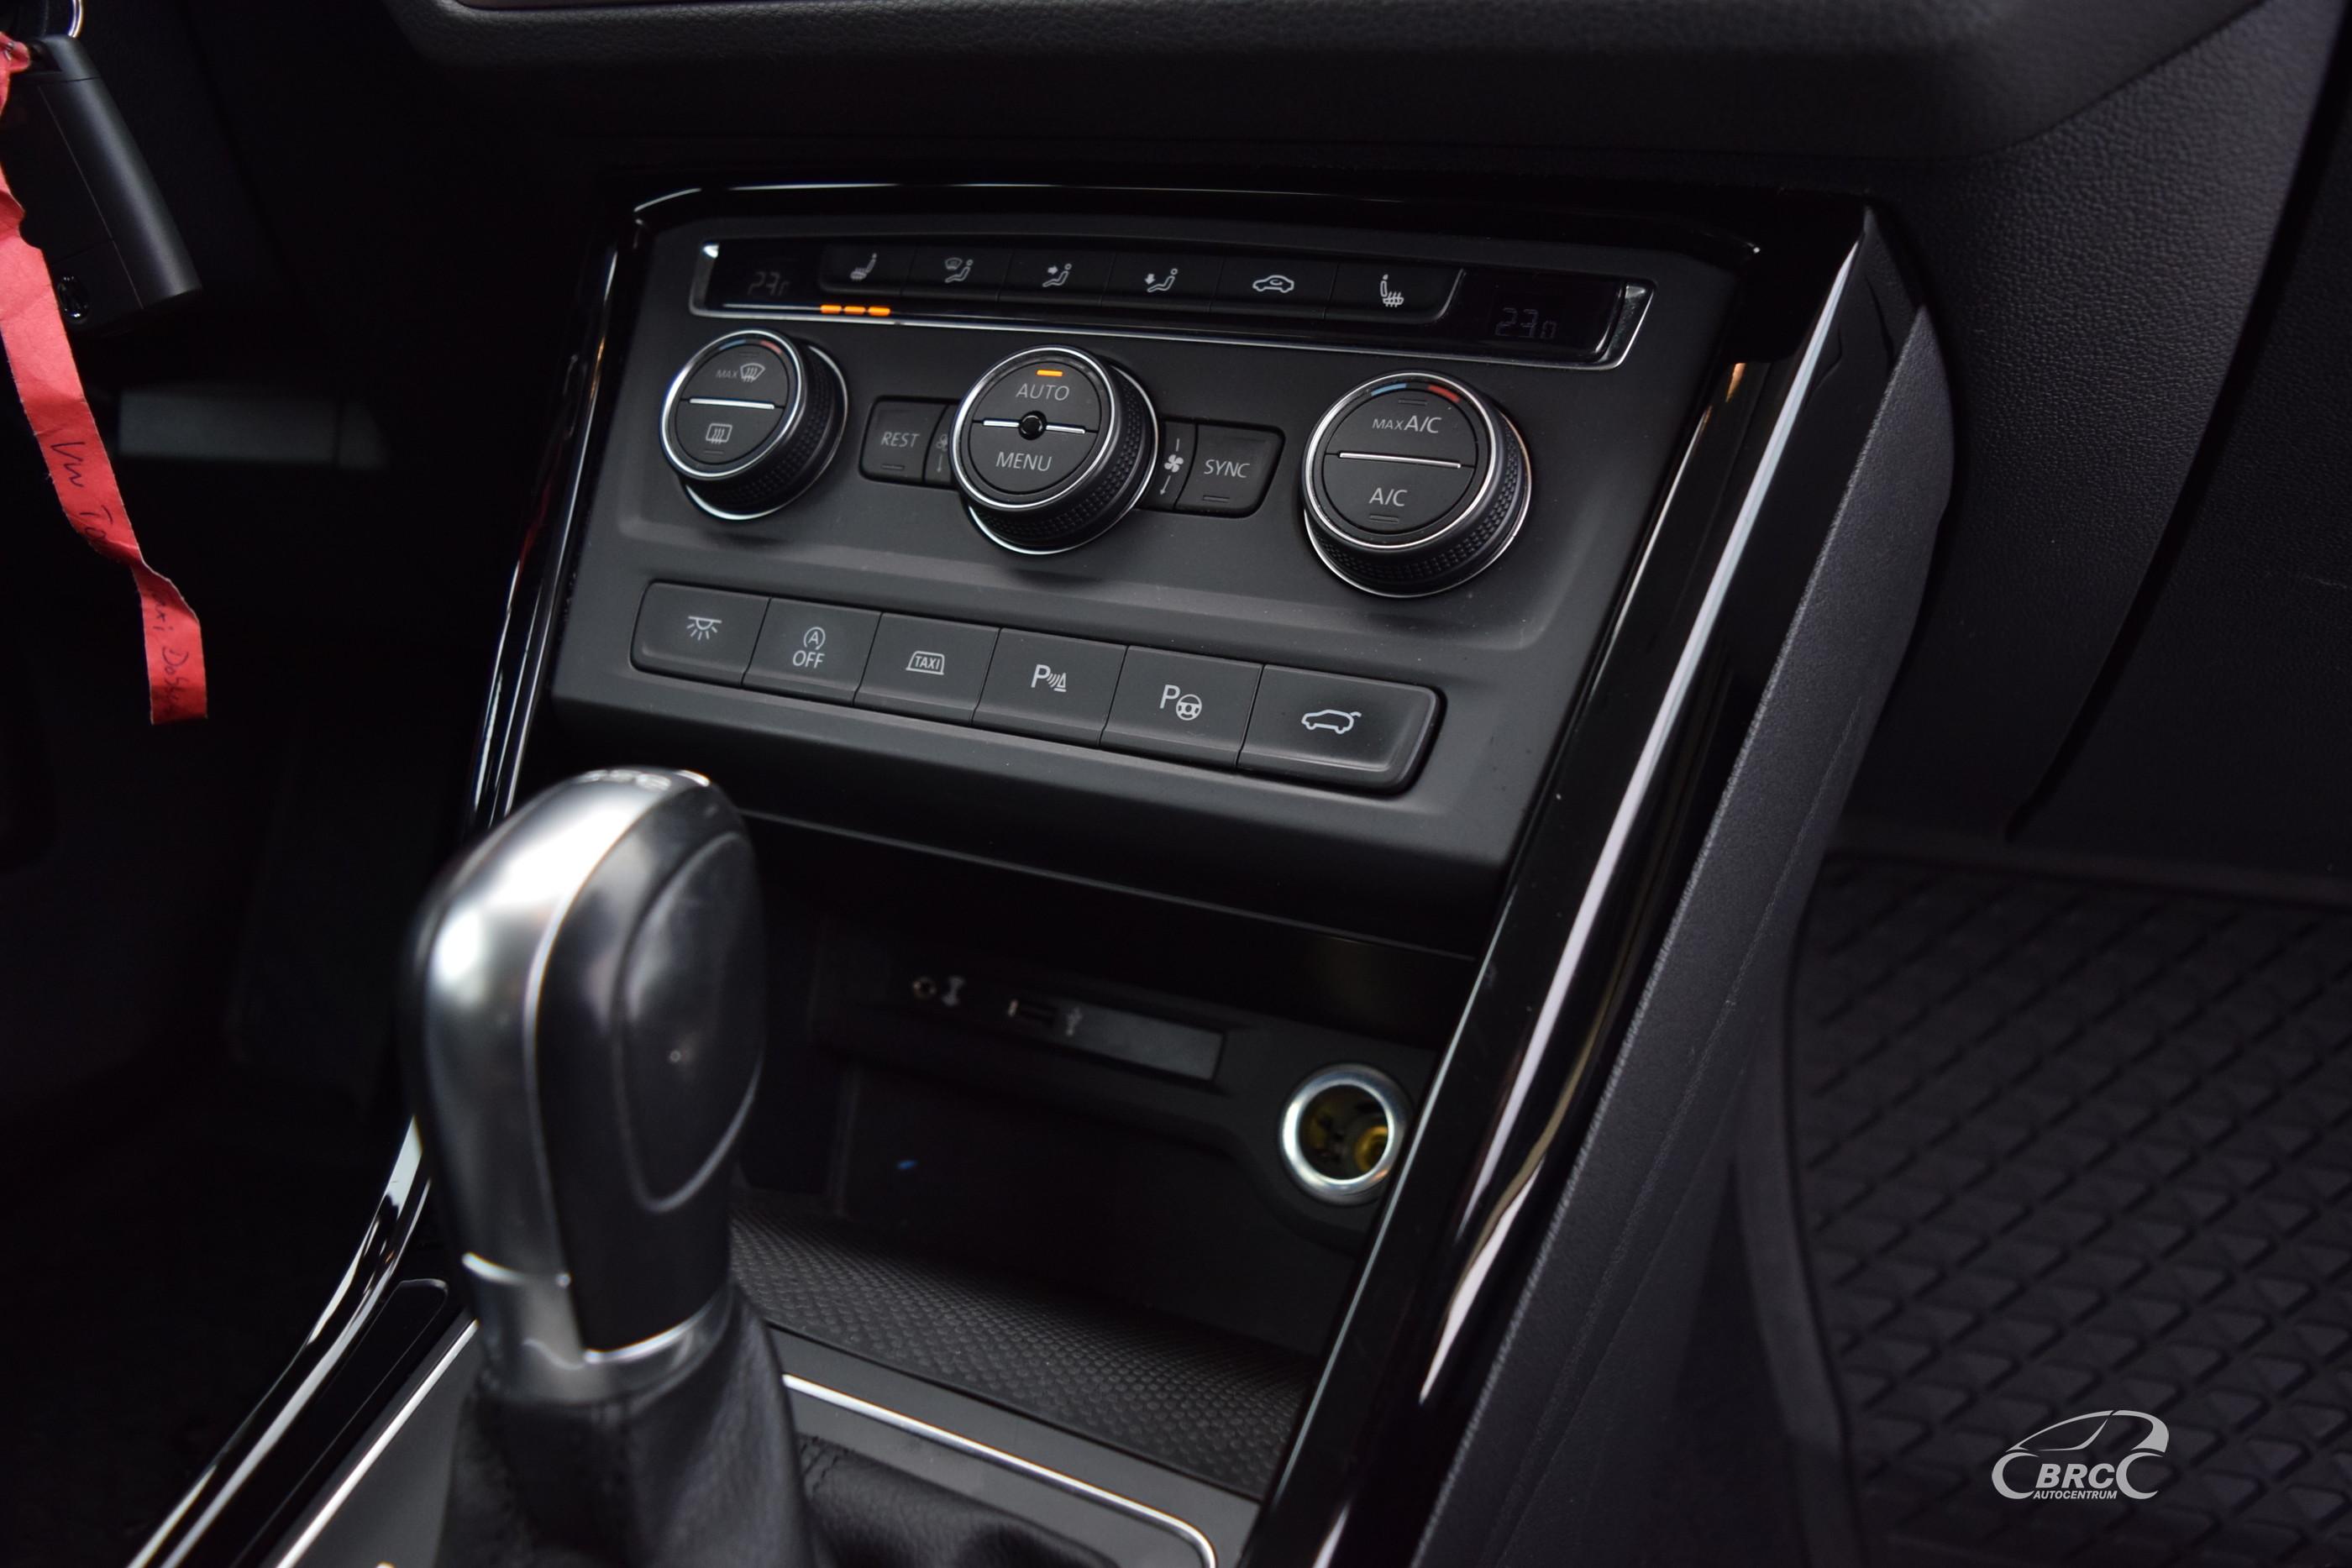 Volkswagen Touran 2.0TDI DSG 7 seats